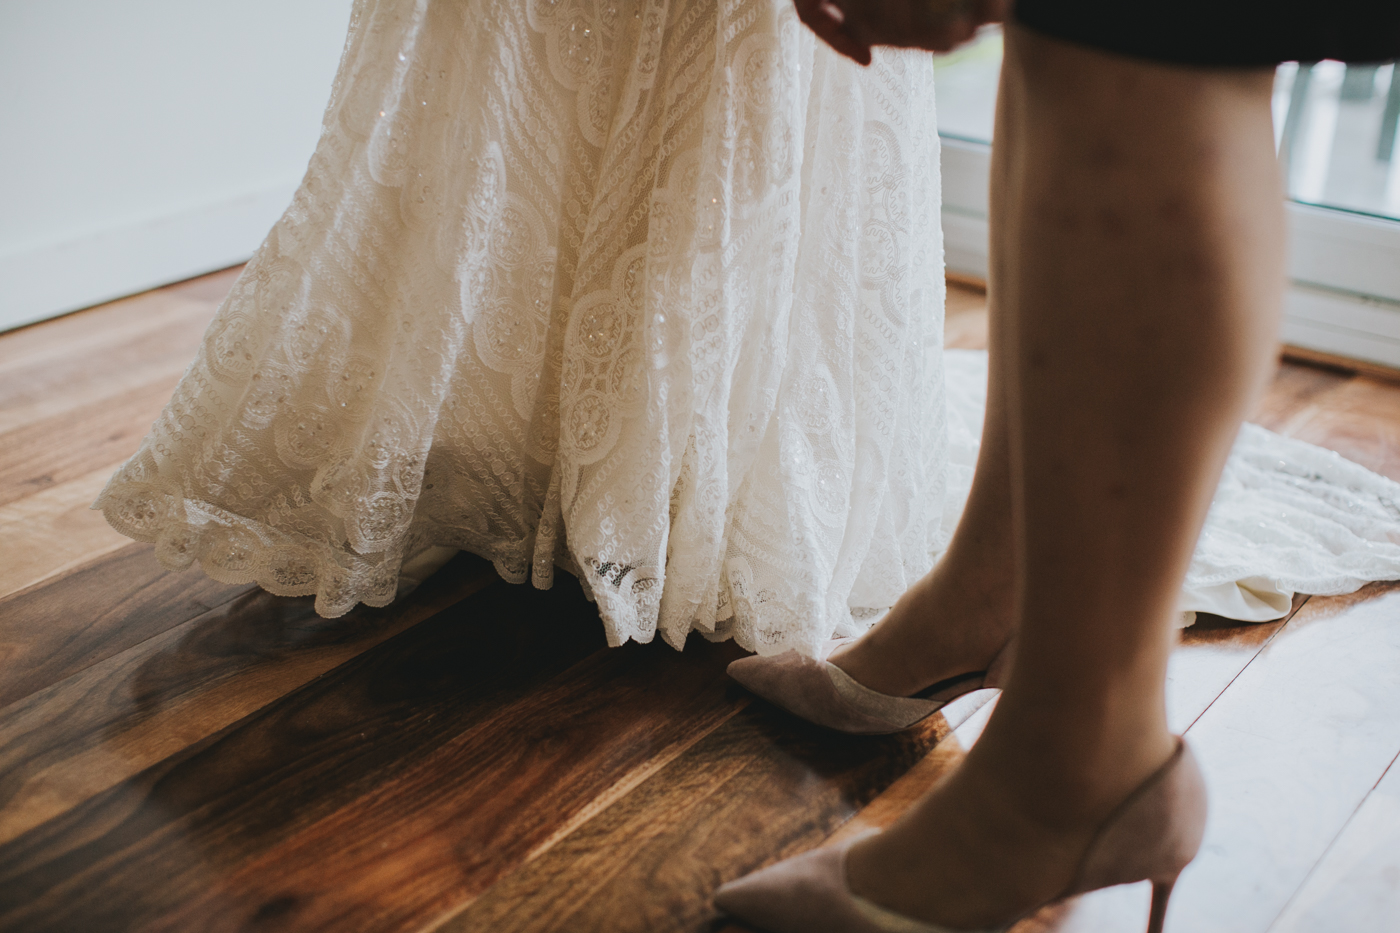 Jo & Tom Wedding - The Grounds of Alexandria - Samantha Heather Photography-66.jpg